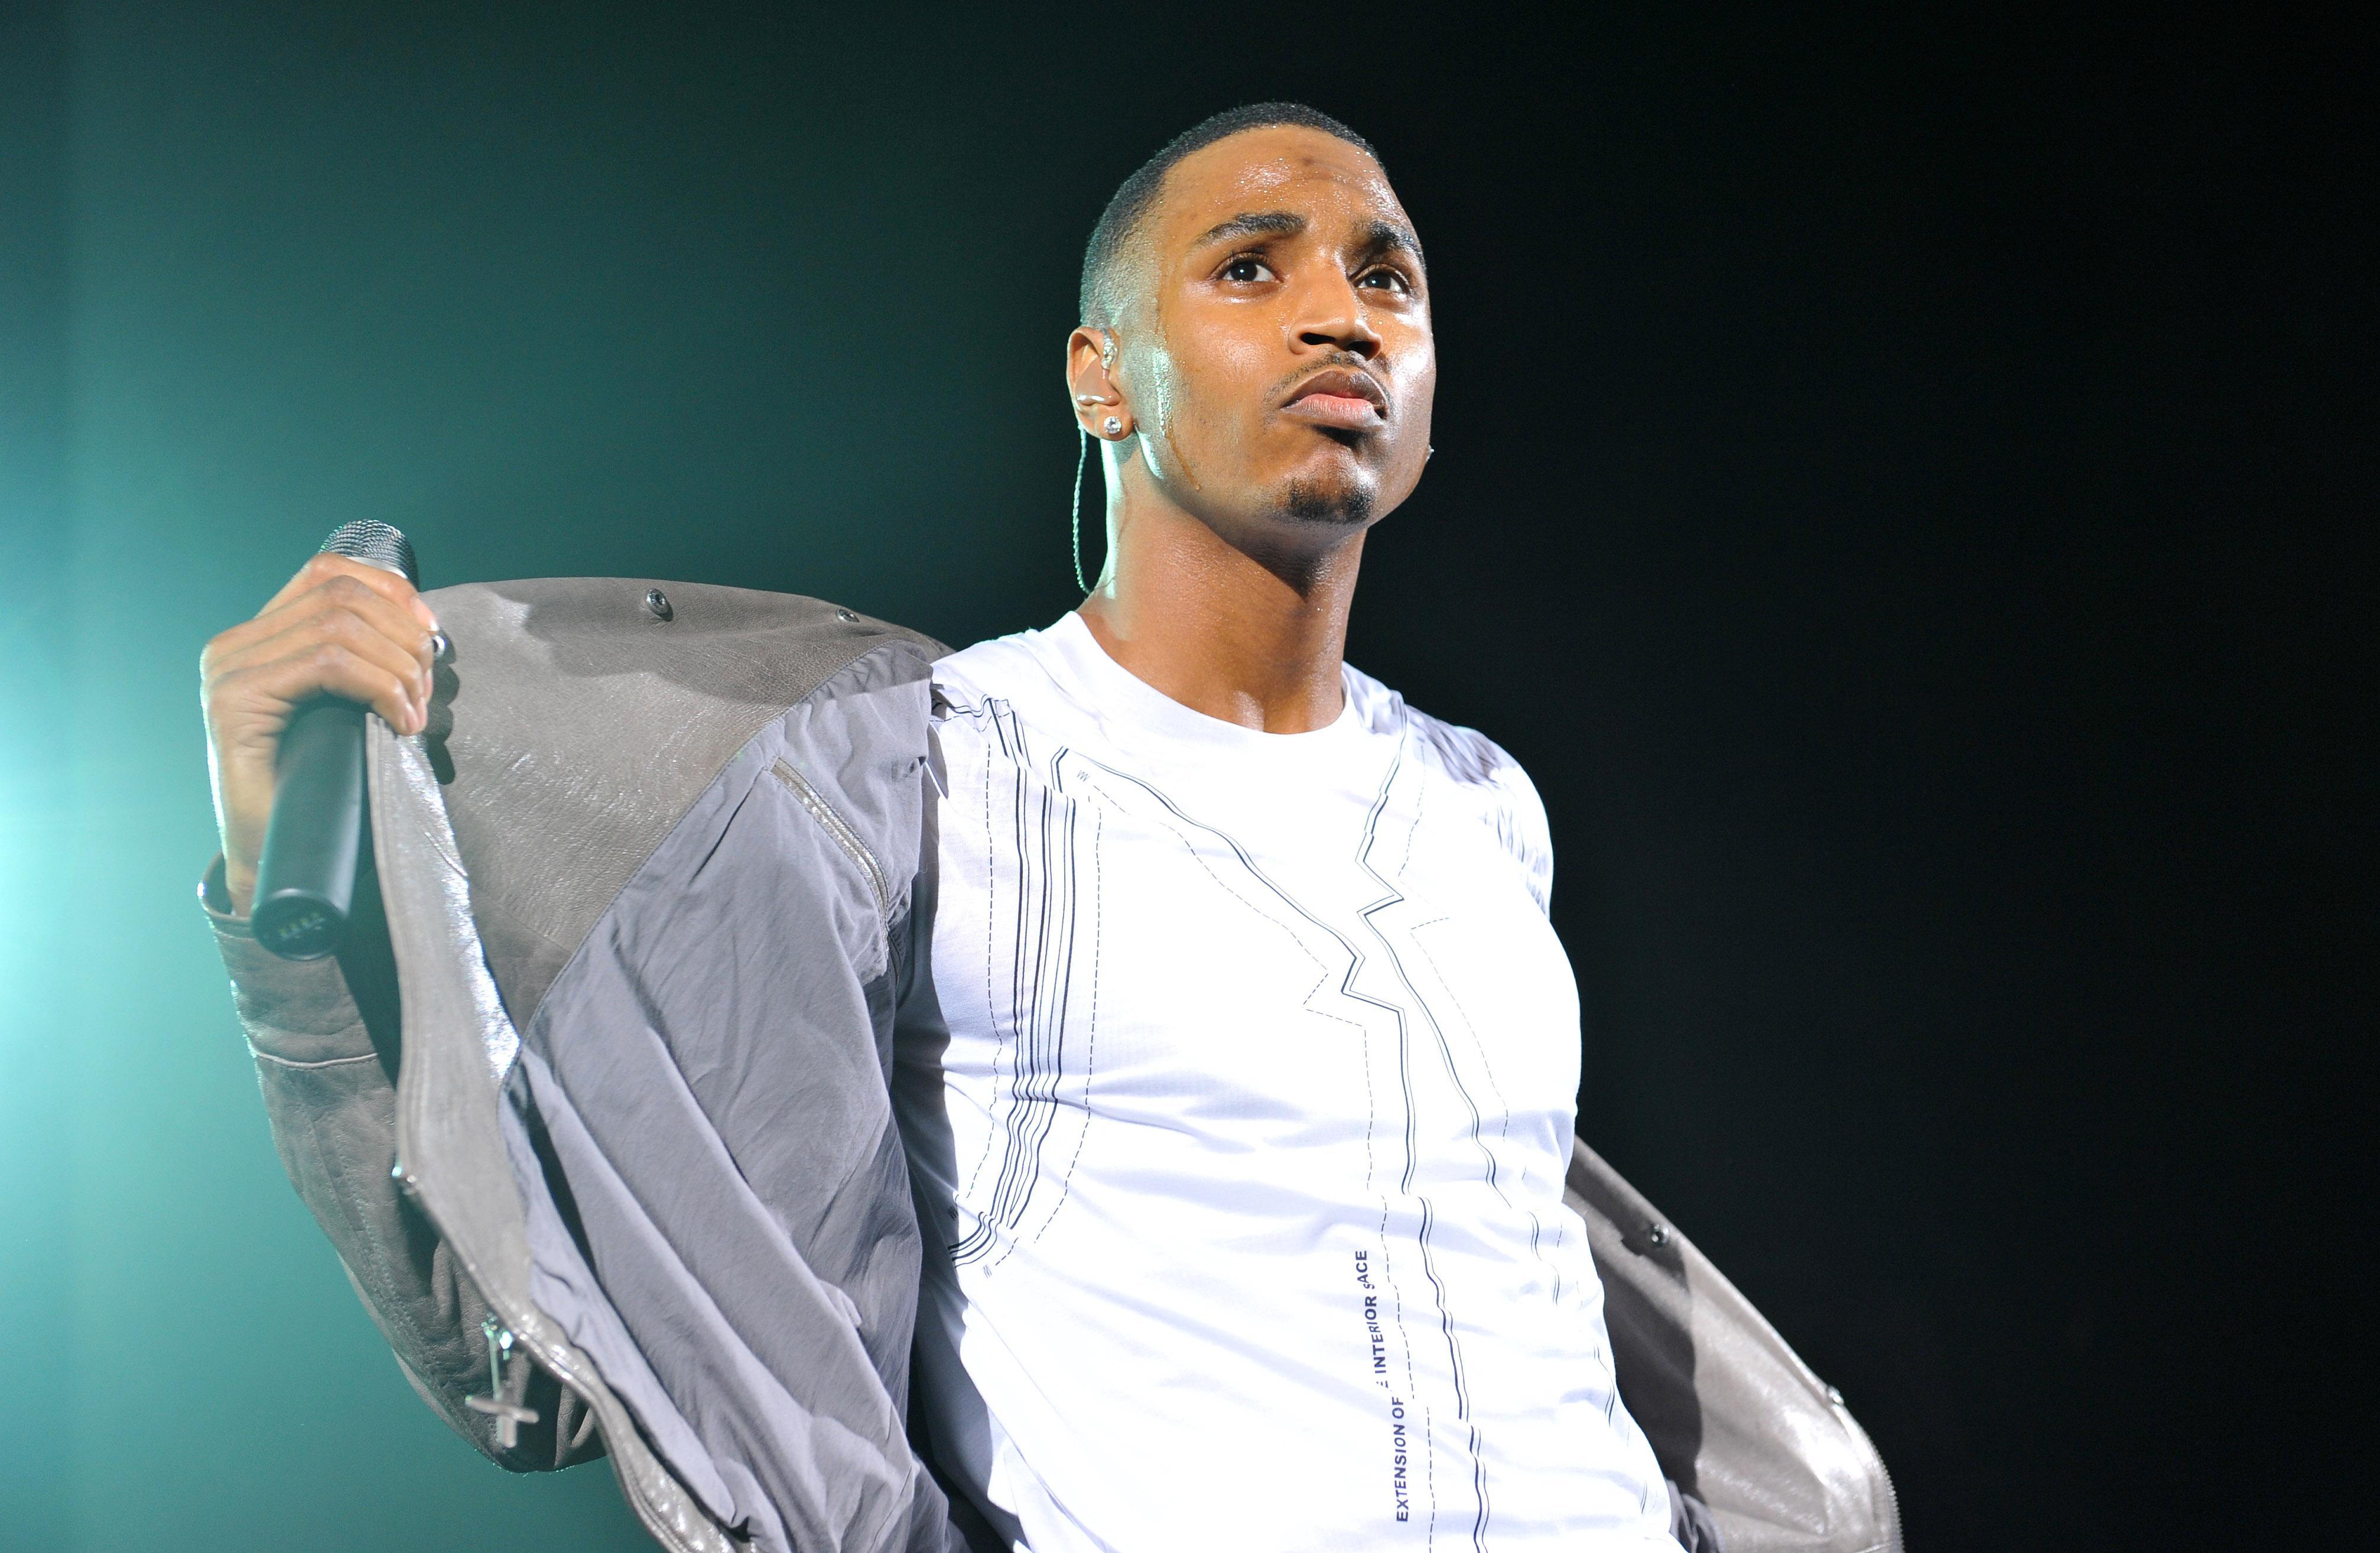 Trey Songz Performs At HMV Hammersmith Apollo In London